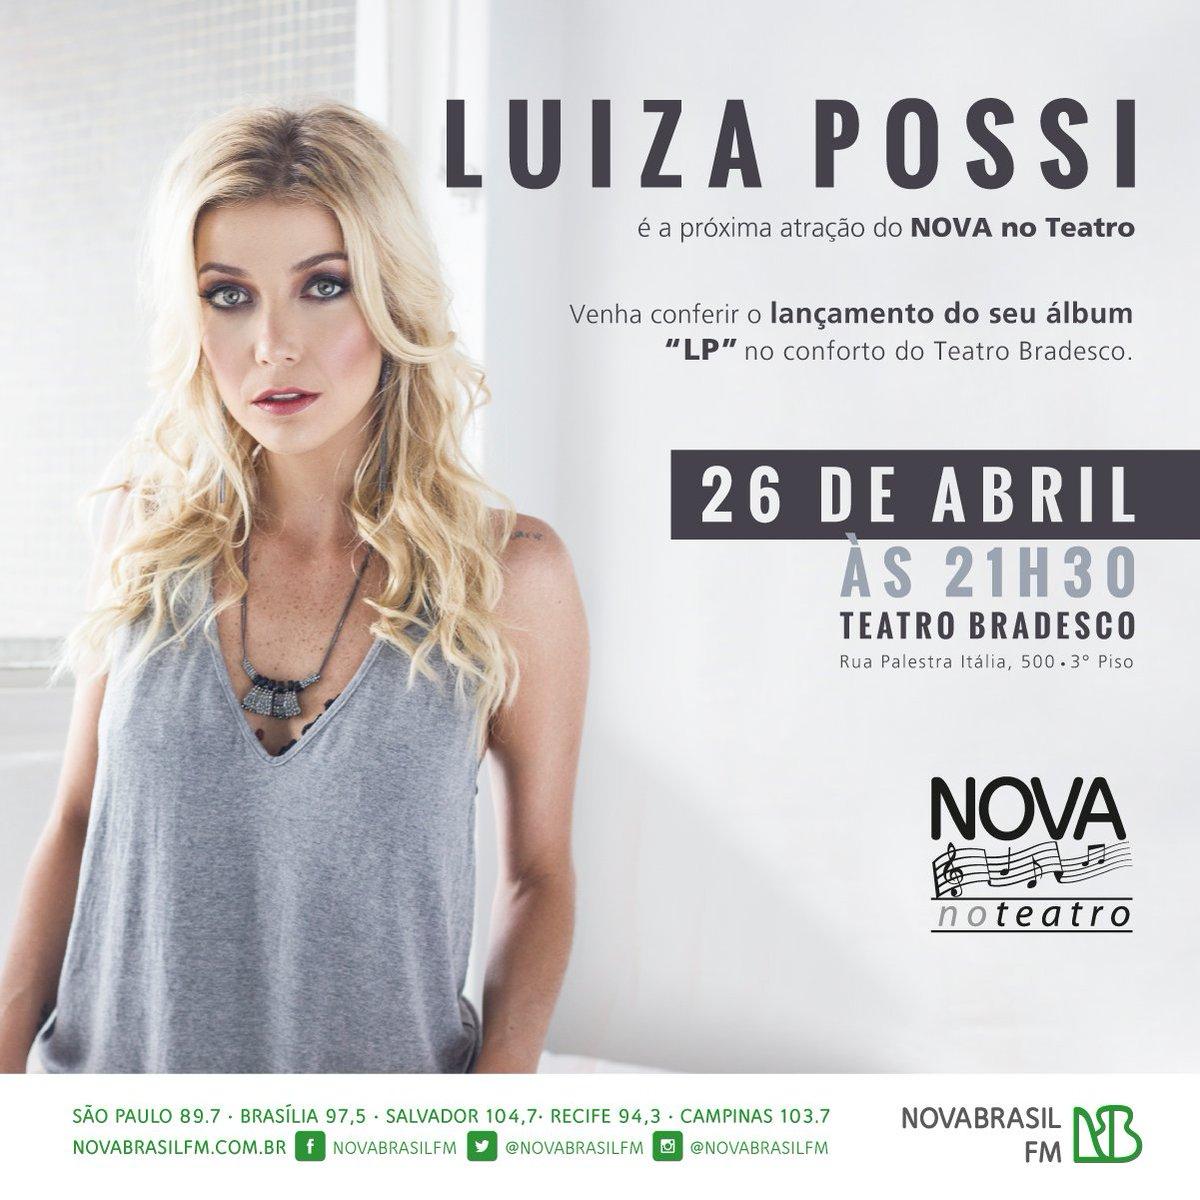 Dê RT e concorra a 1 par de ingressos para o show de @luizapossi, dia 26/04, pelo #NOVAnoTeatro https://t.co/zHnAcJhClv